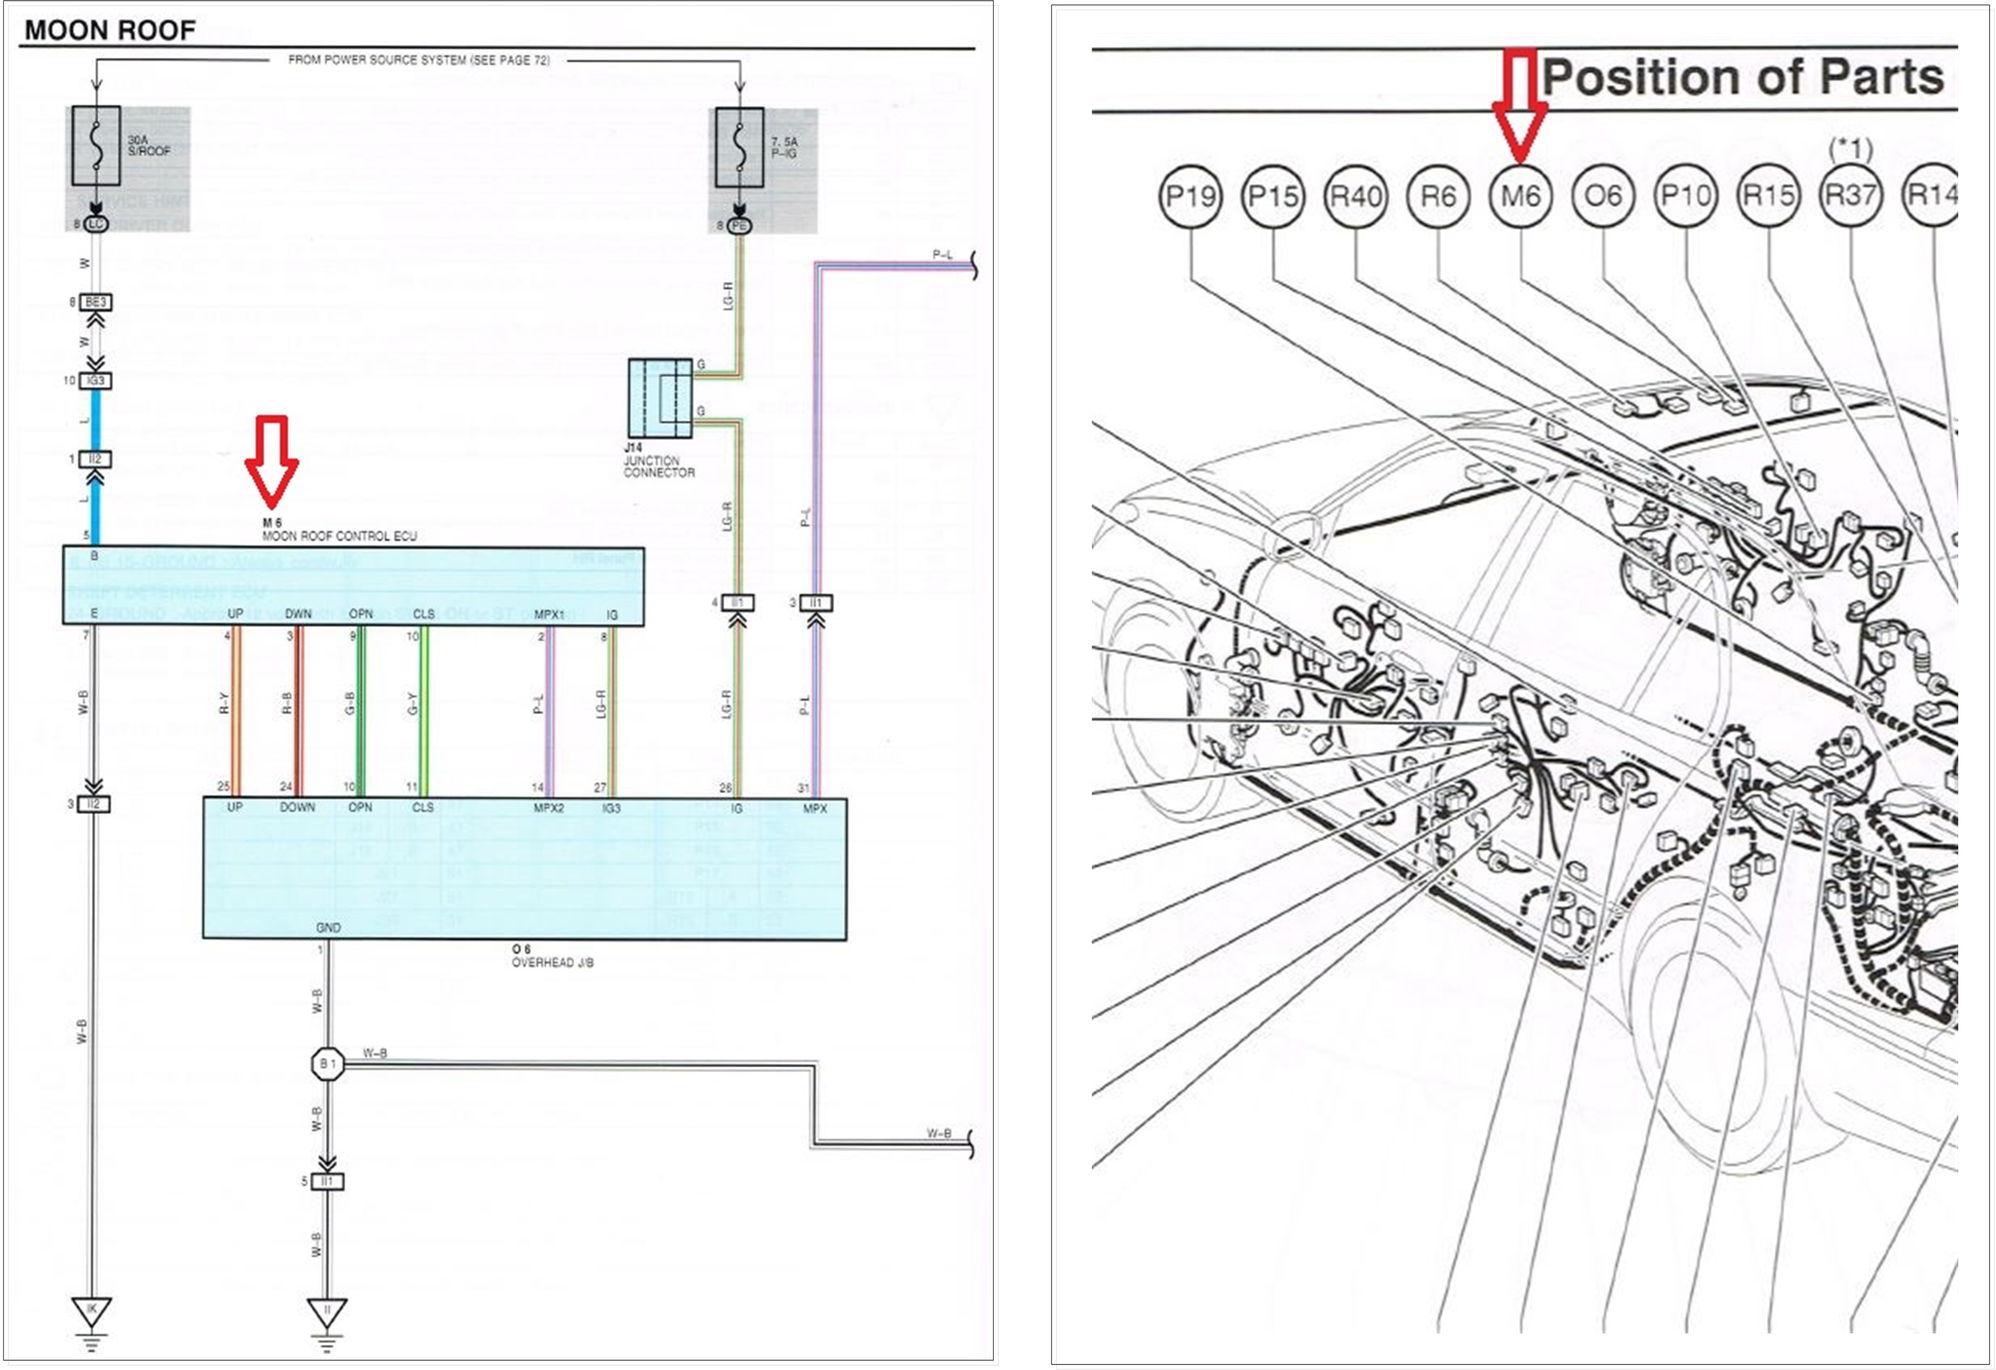 hight resolution of lexus sc430 fuse box diagram lexus sc430 interior wiring 91 ls400 wiring diagram 93 lexus es300 radio wiring